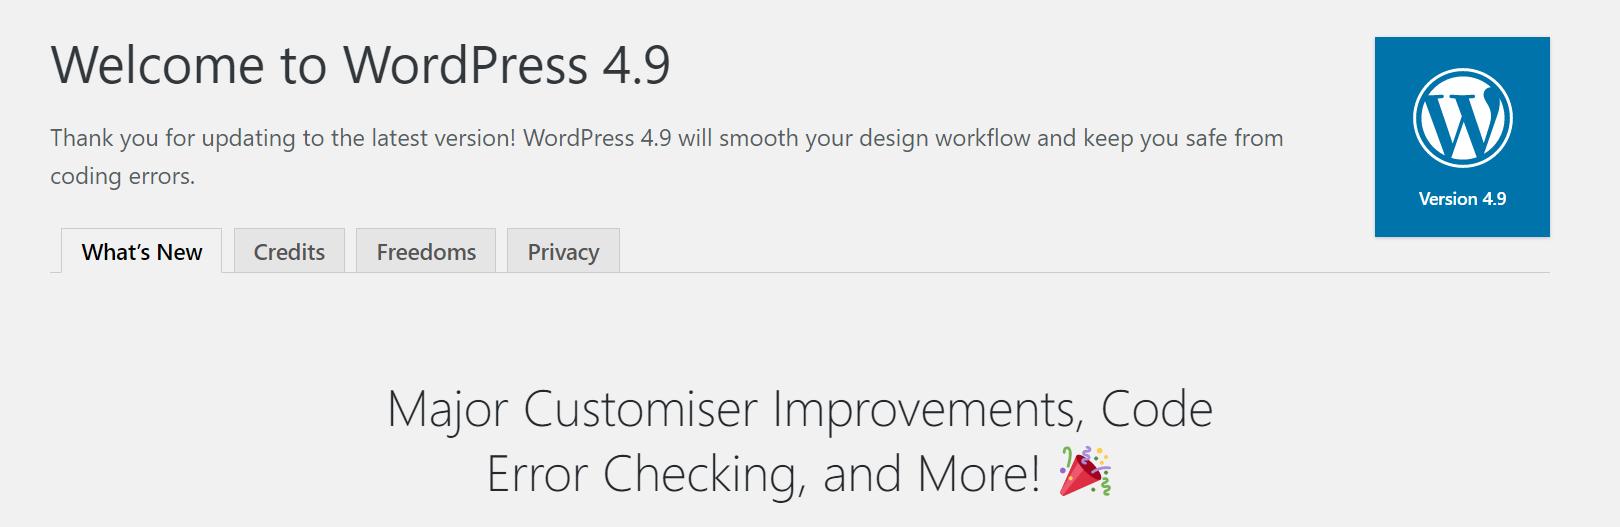 Welcome to WordPress 4.9